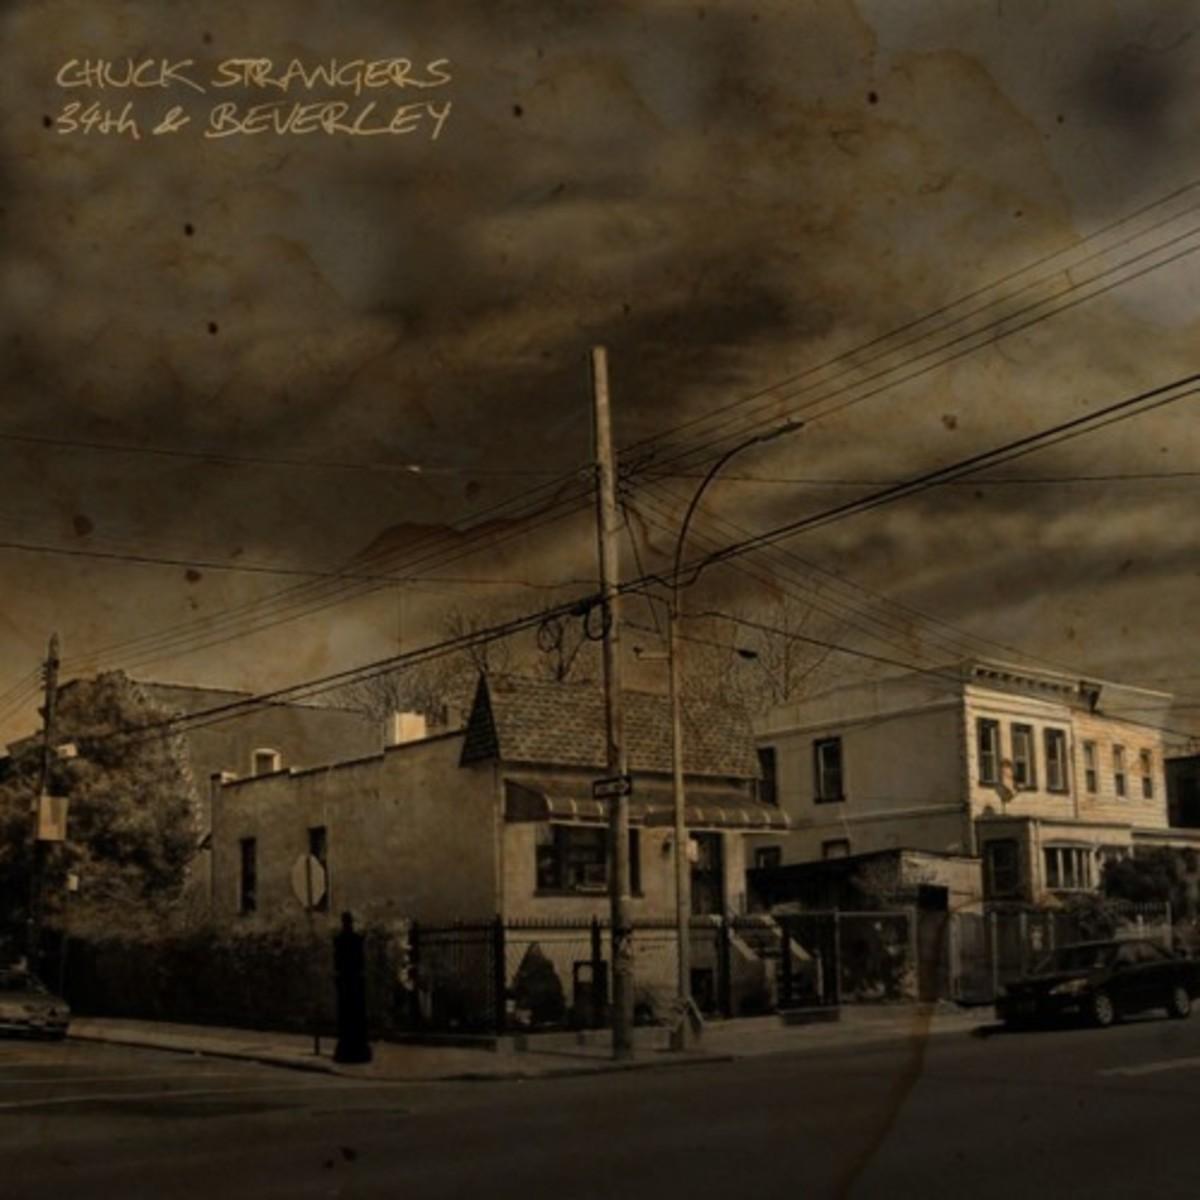 chuck-strangers-34th-beverley.jpg